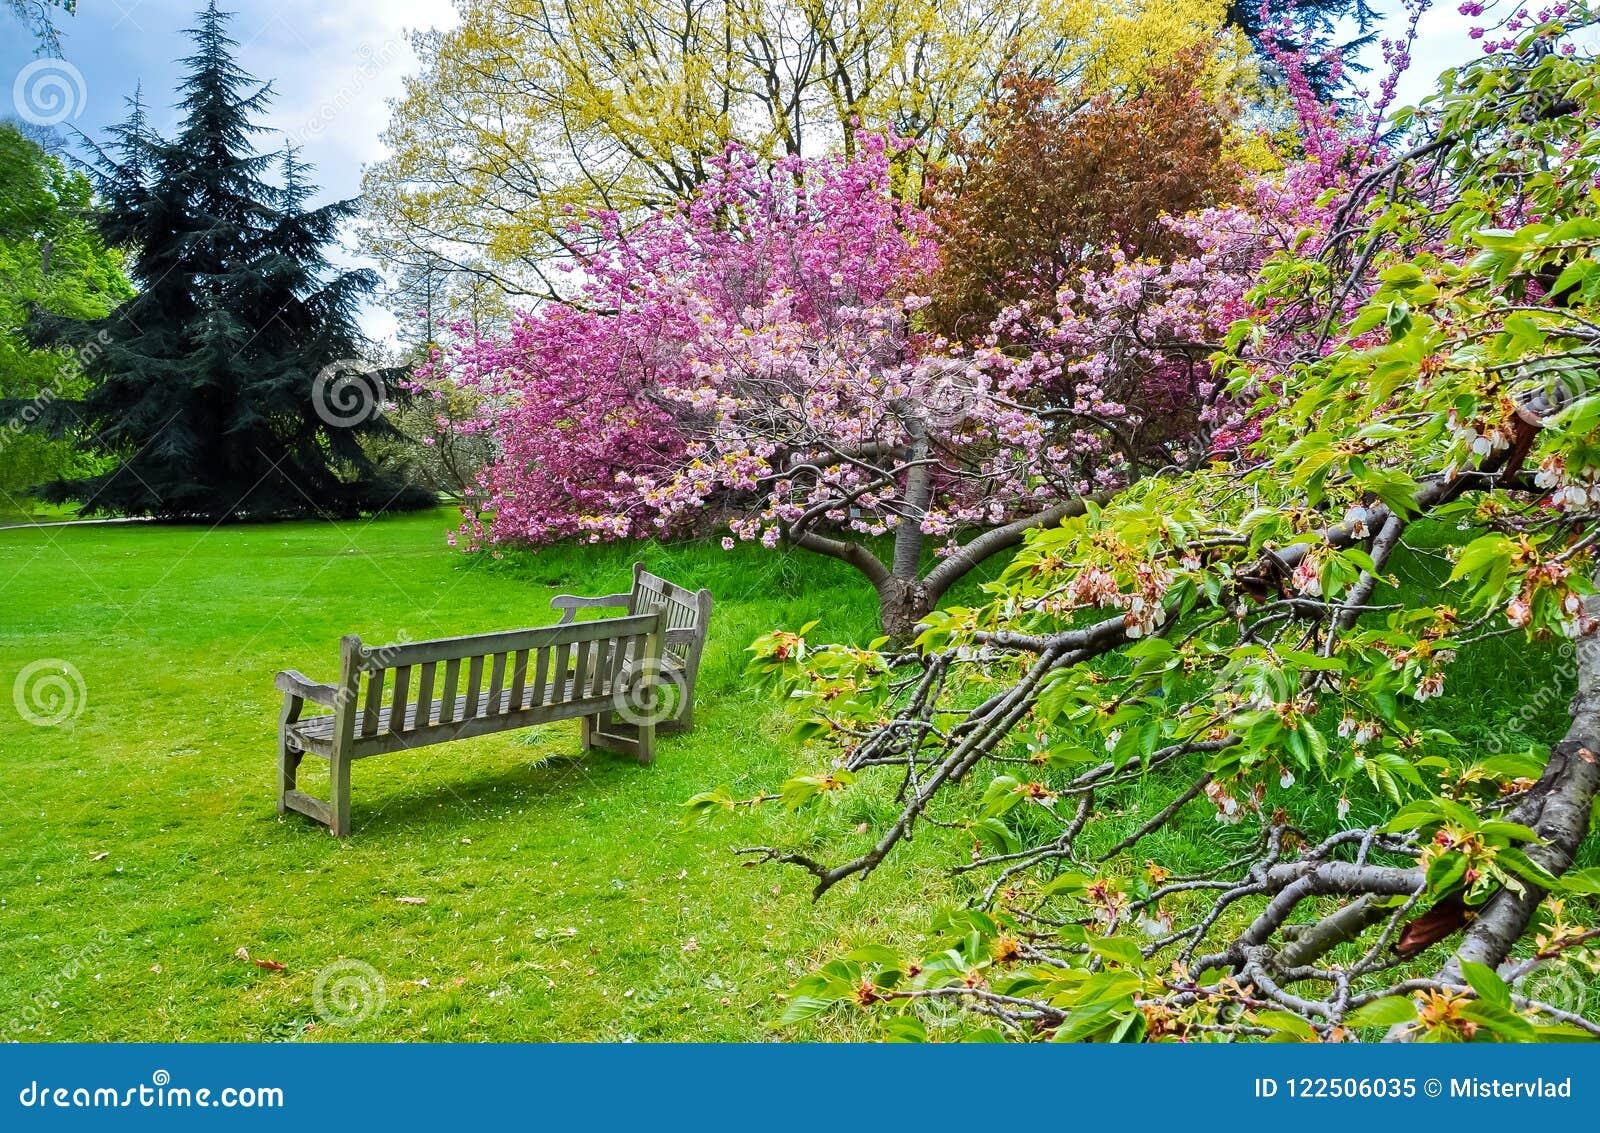 Kew botanical garden in spring, London, United Kingdom